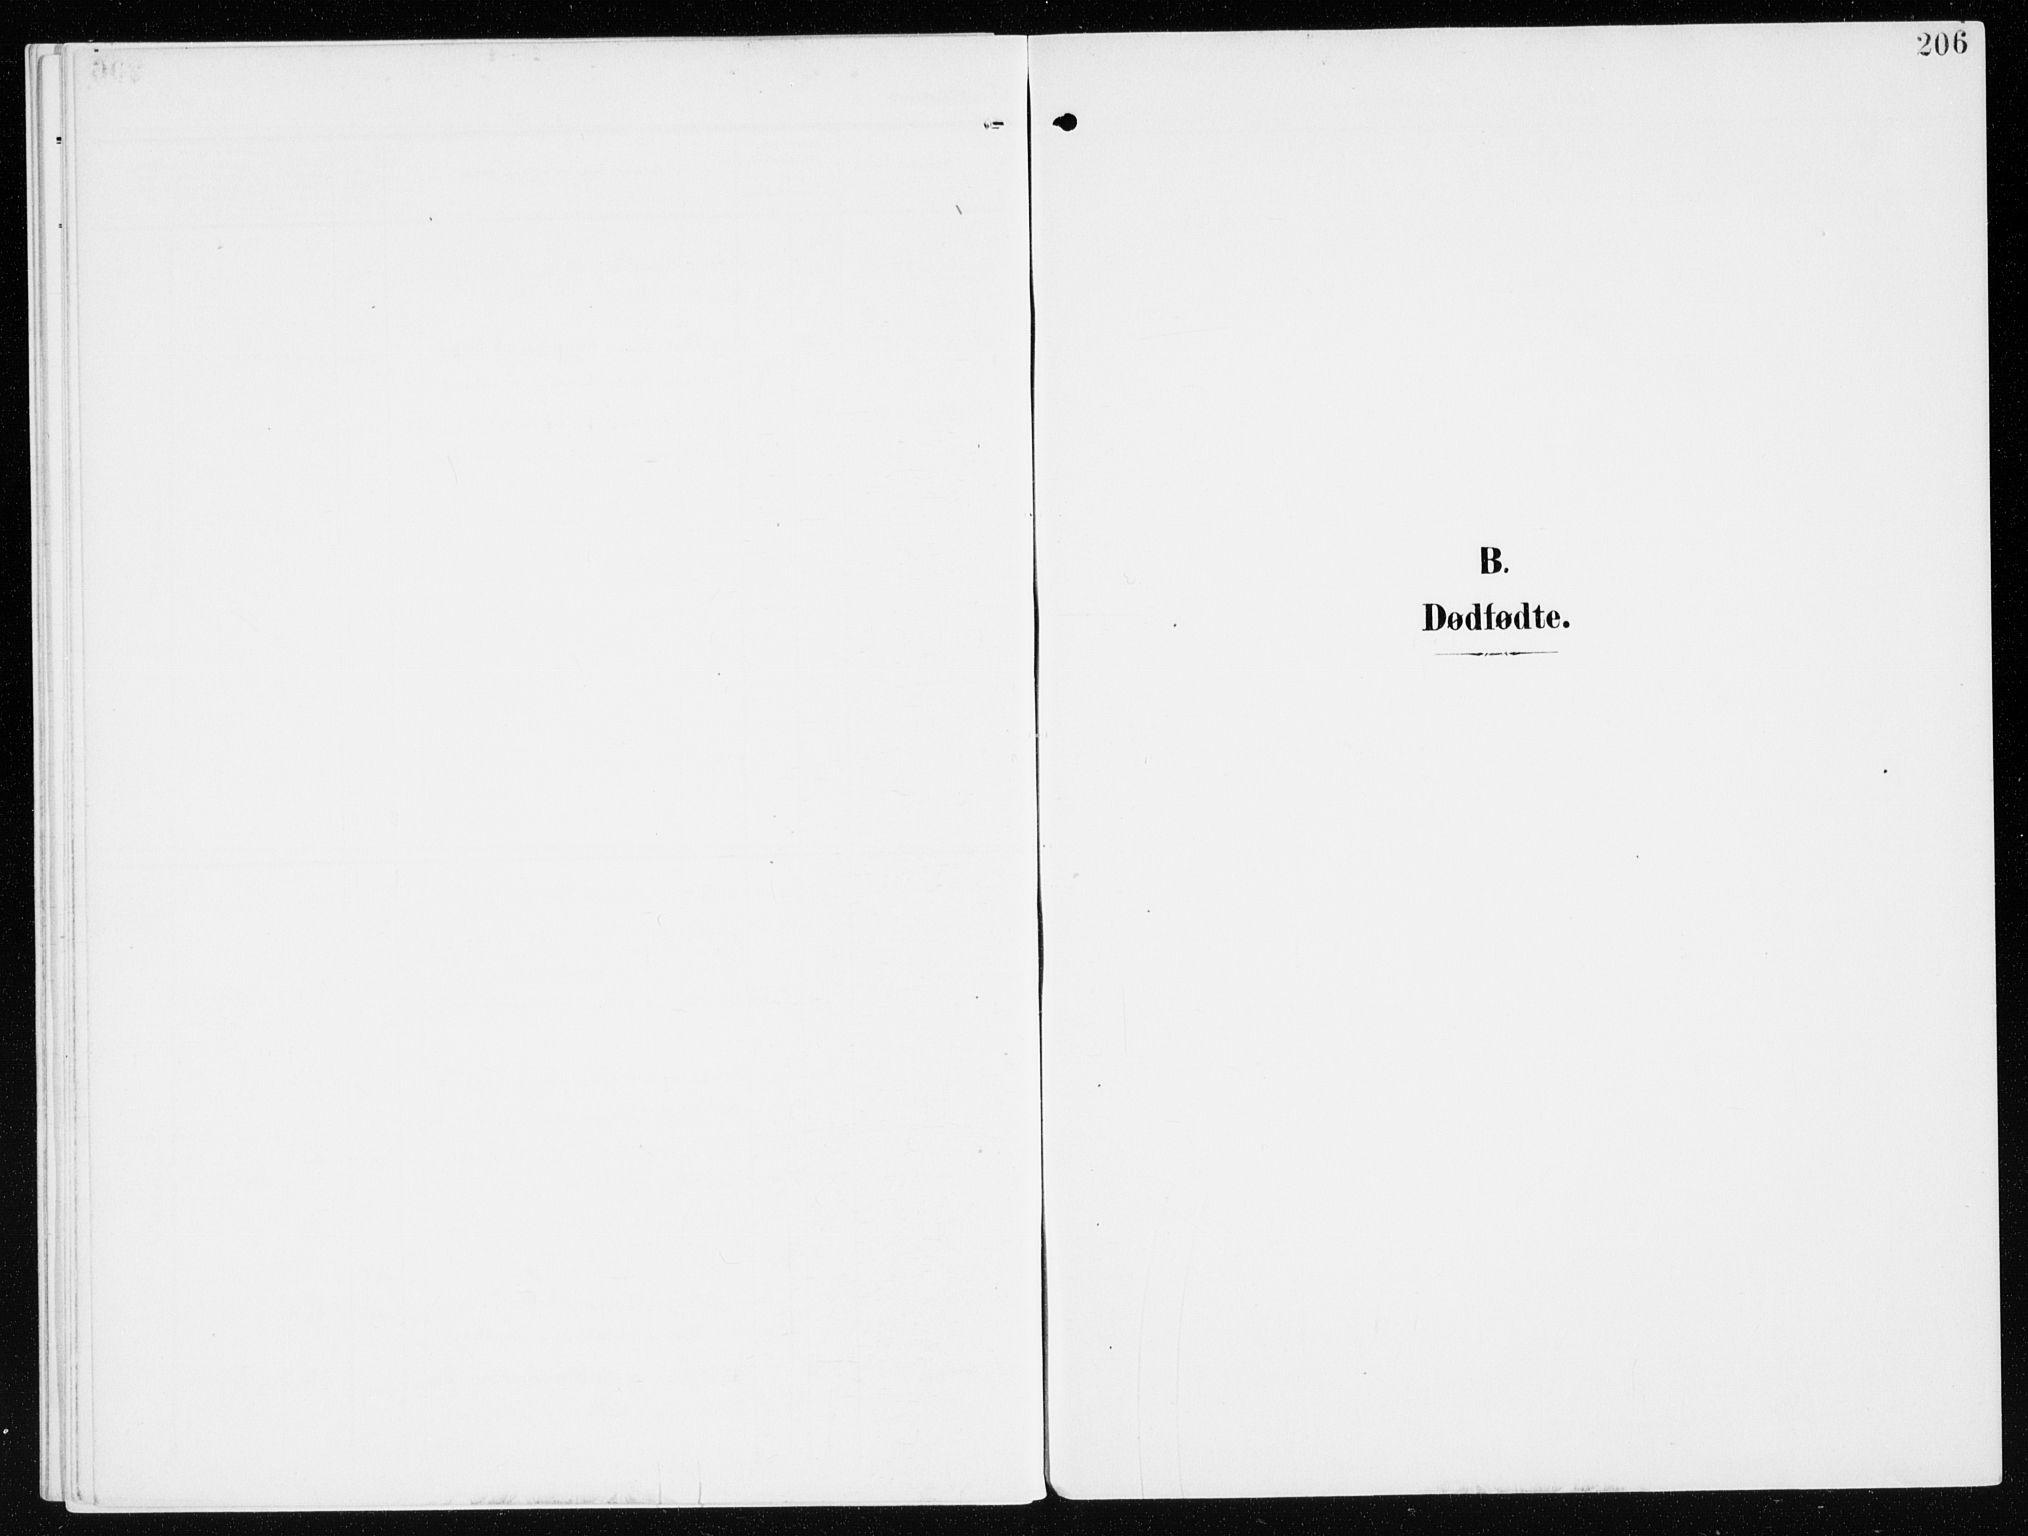 SAH, Furnes prestekontor, K/Ka/L0001: Ministerialbok nr. 1, 1907-1935, s. 206